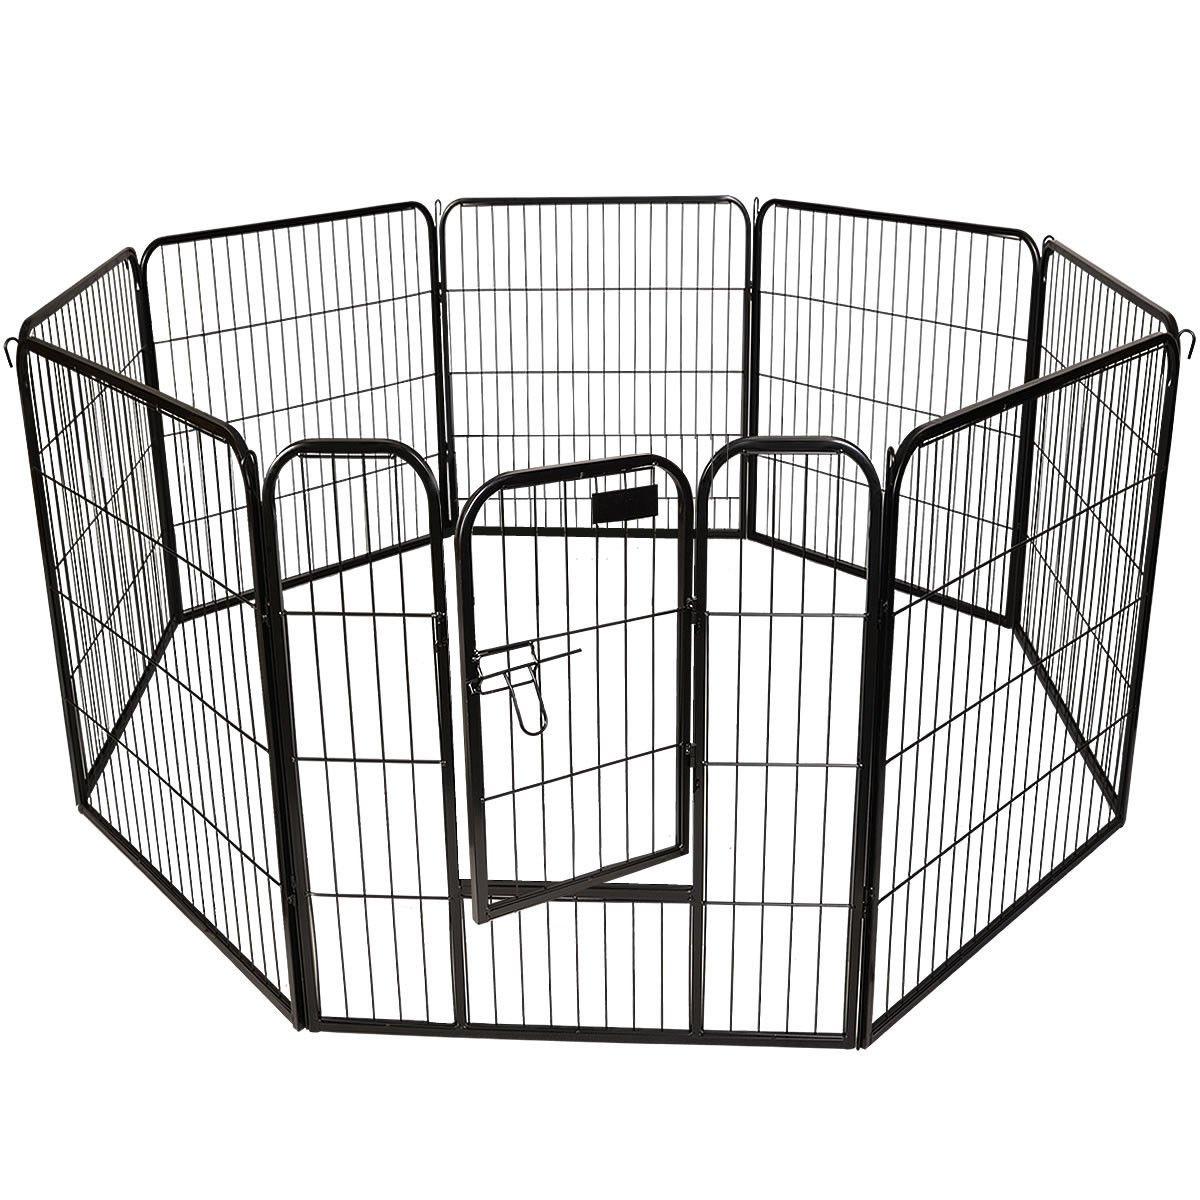 32''- 8 Panel Heavy Duty Pet Dog Cat Playpen Exercise Fence Black by EGO BIKE